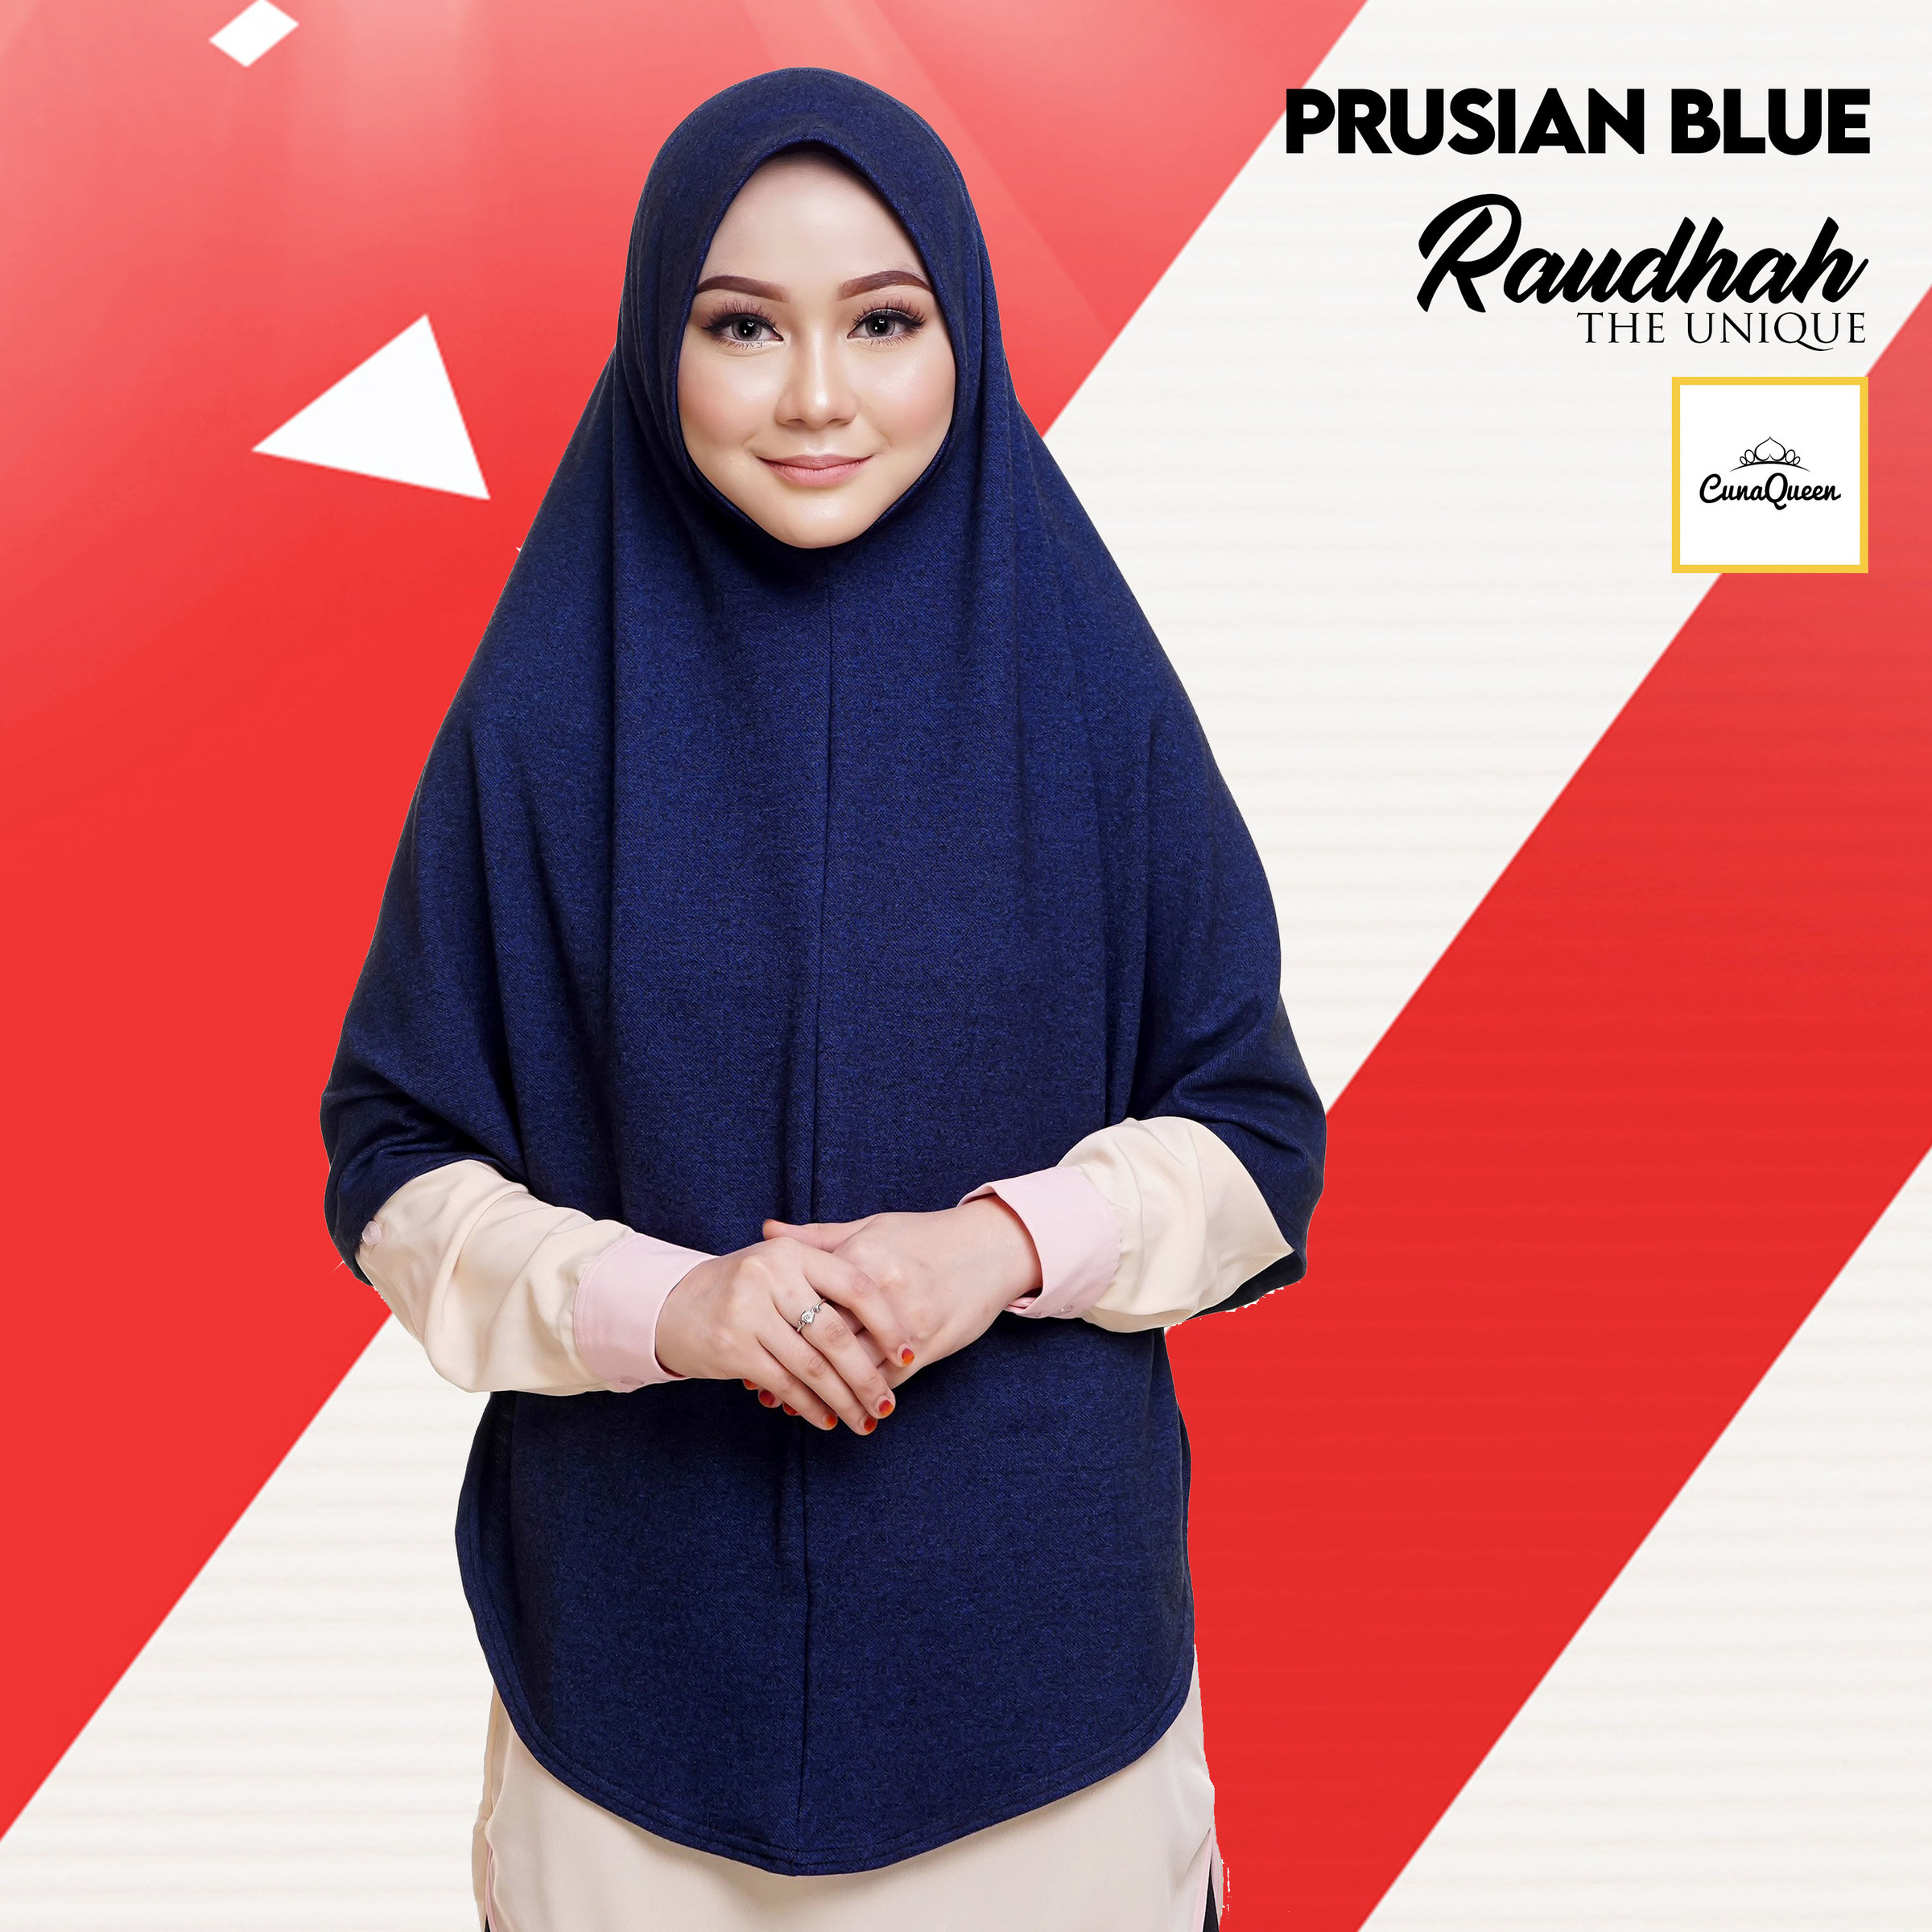 Prusian Blue.jpg